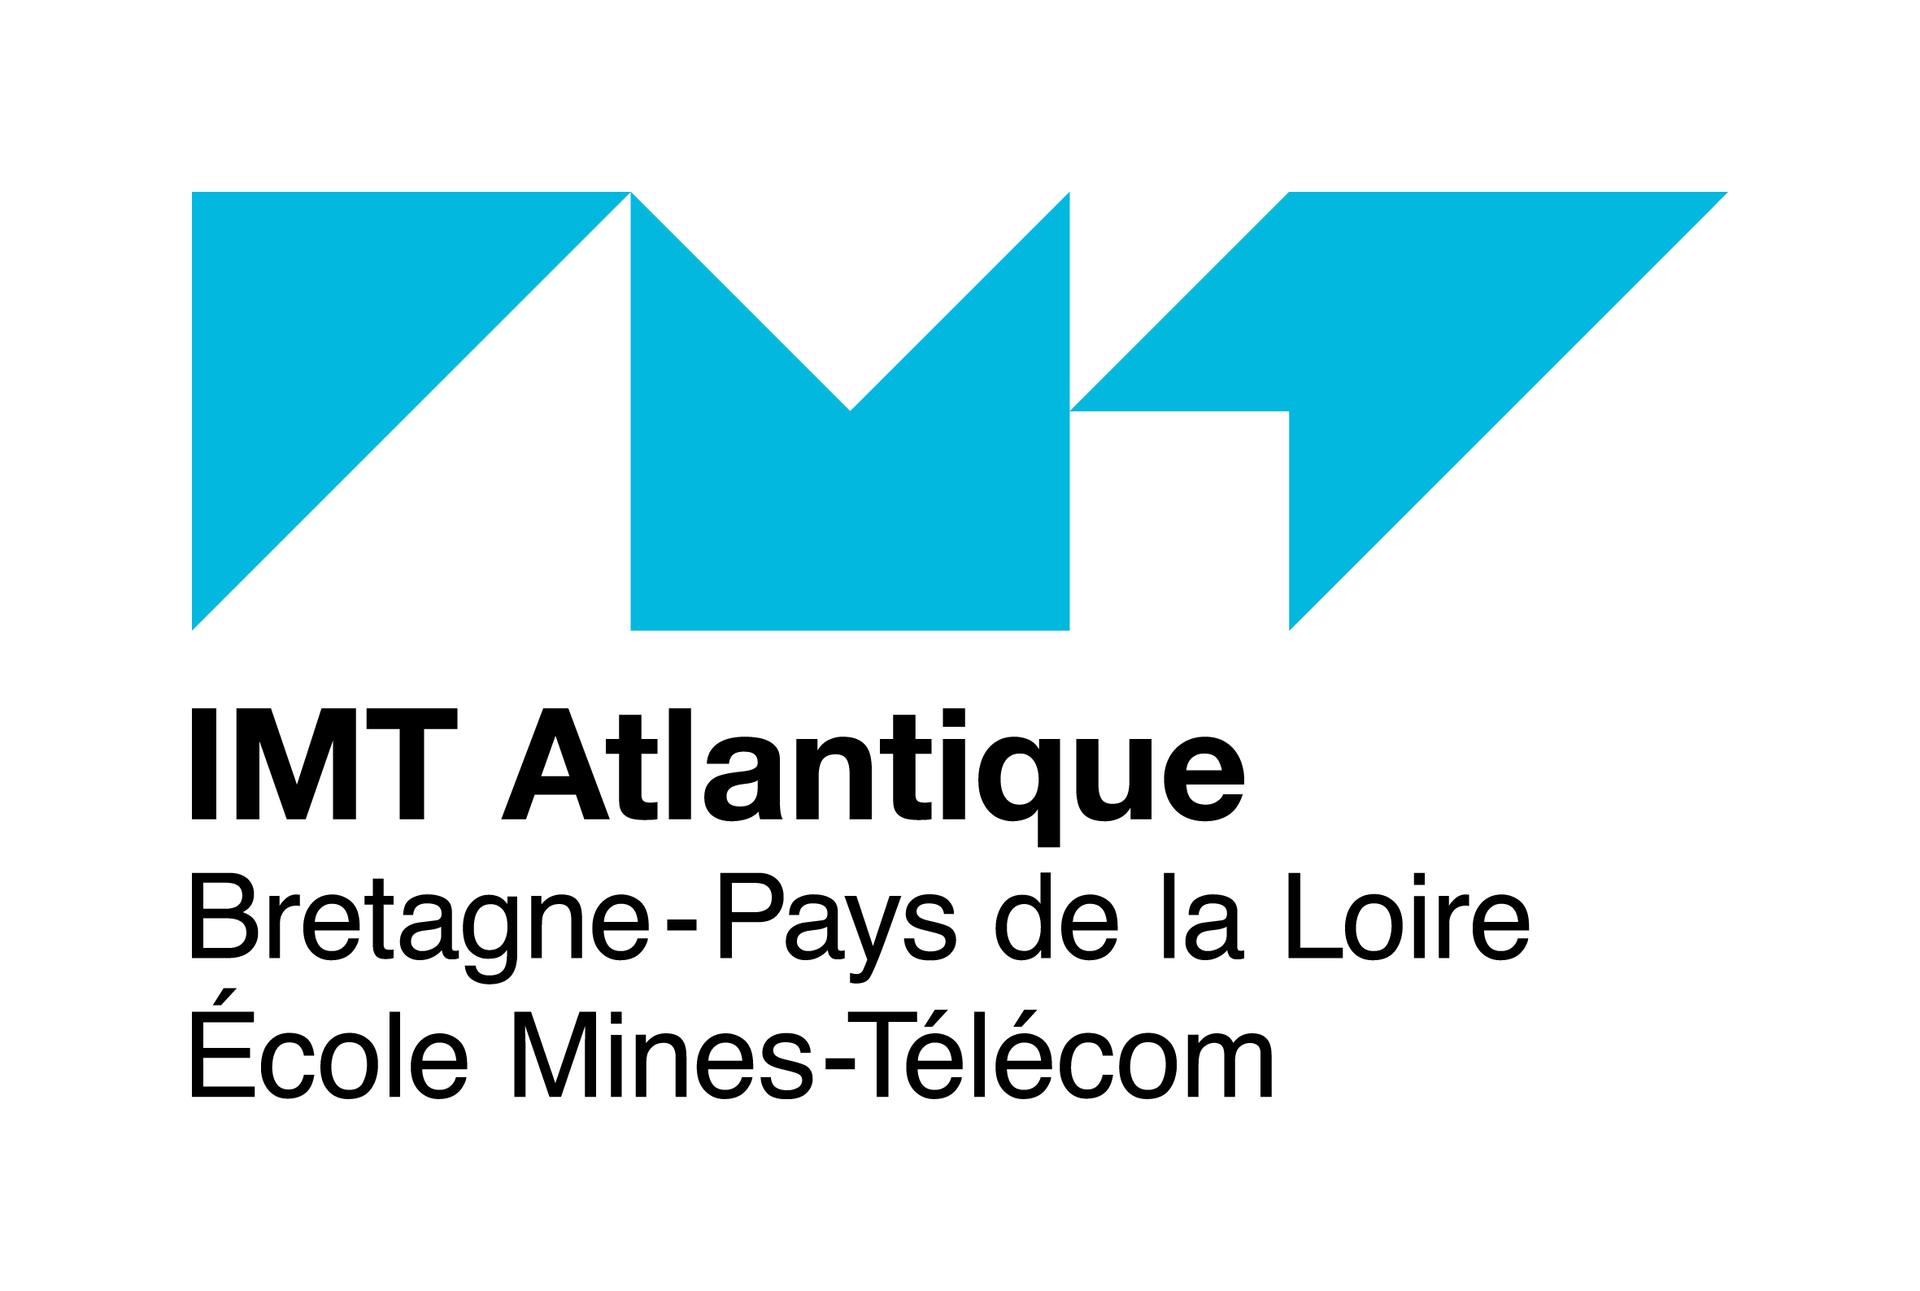 imt_atlantique_university